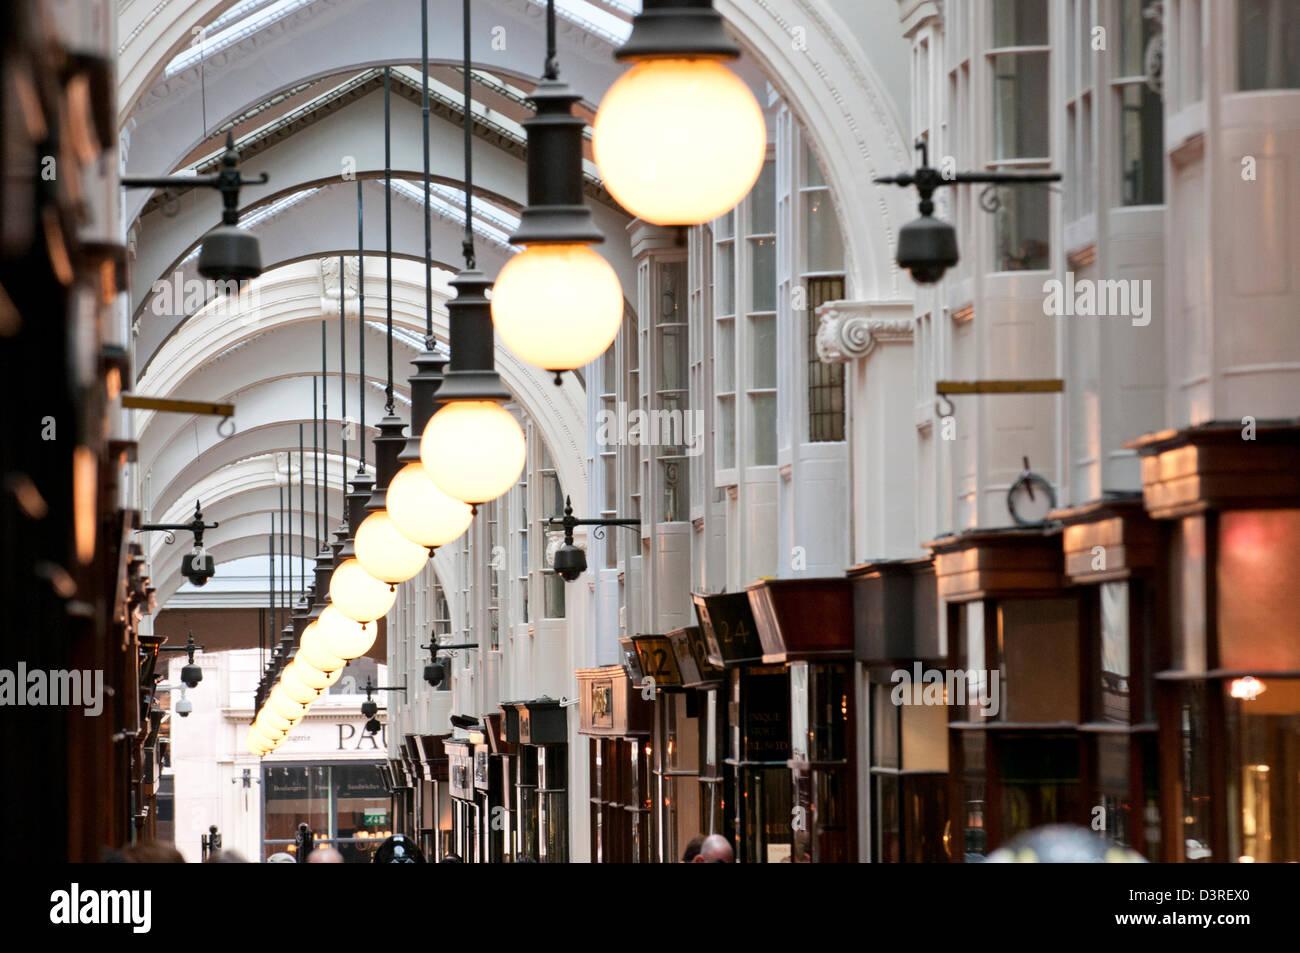 The Burlington Arcade Stock Photo